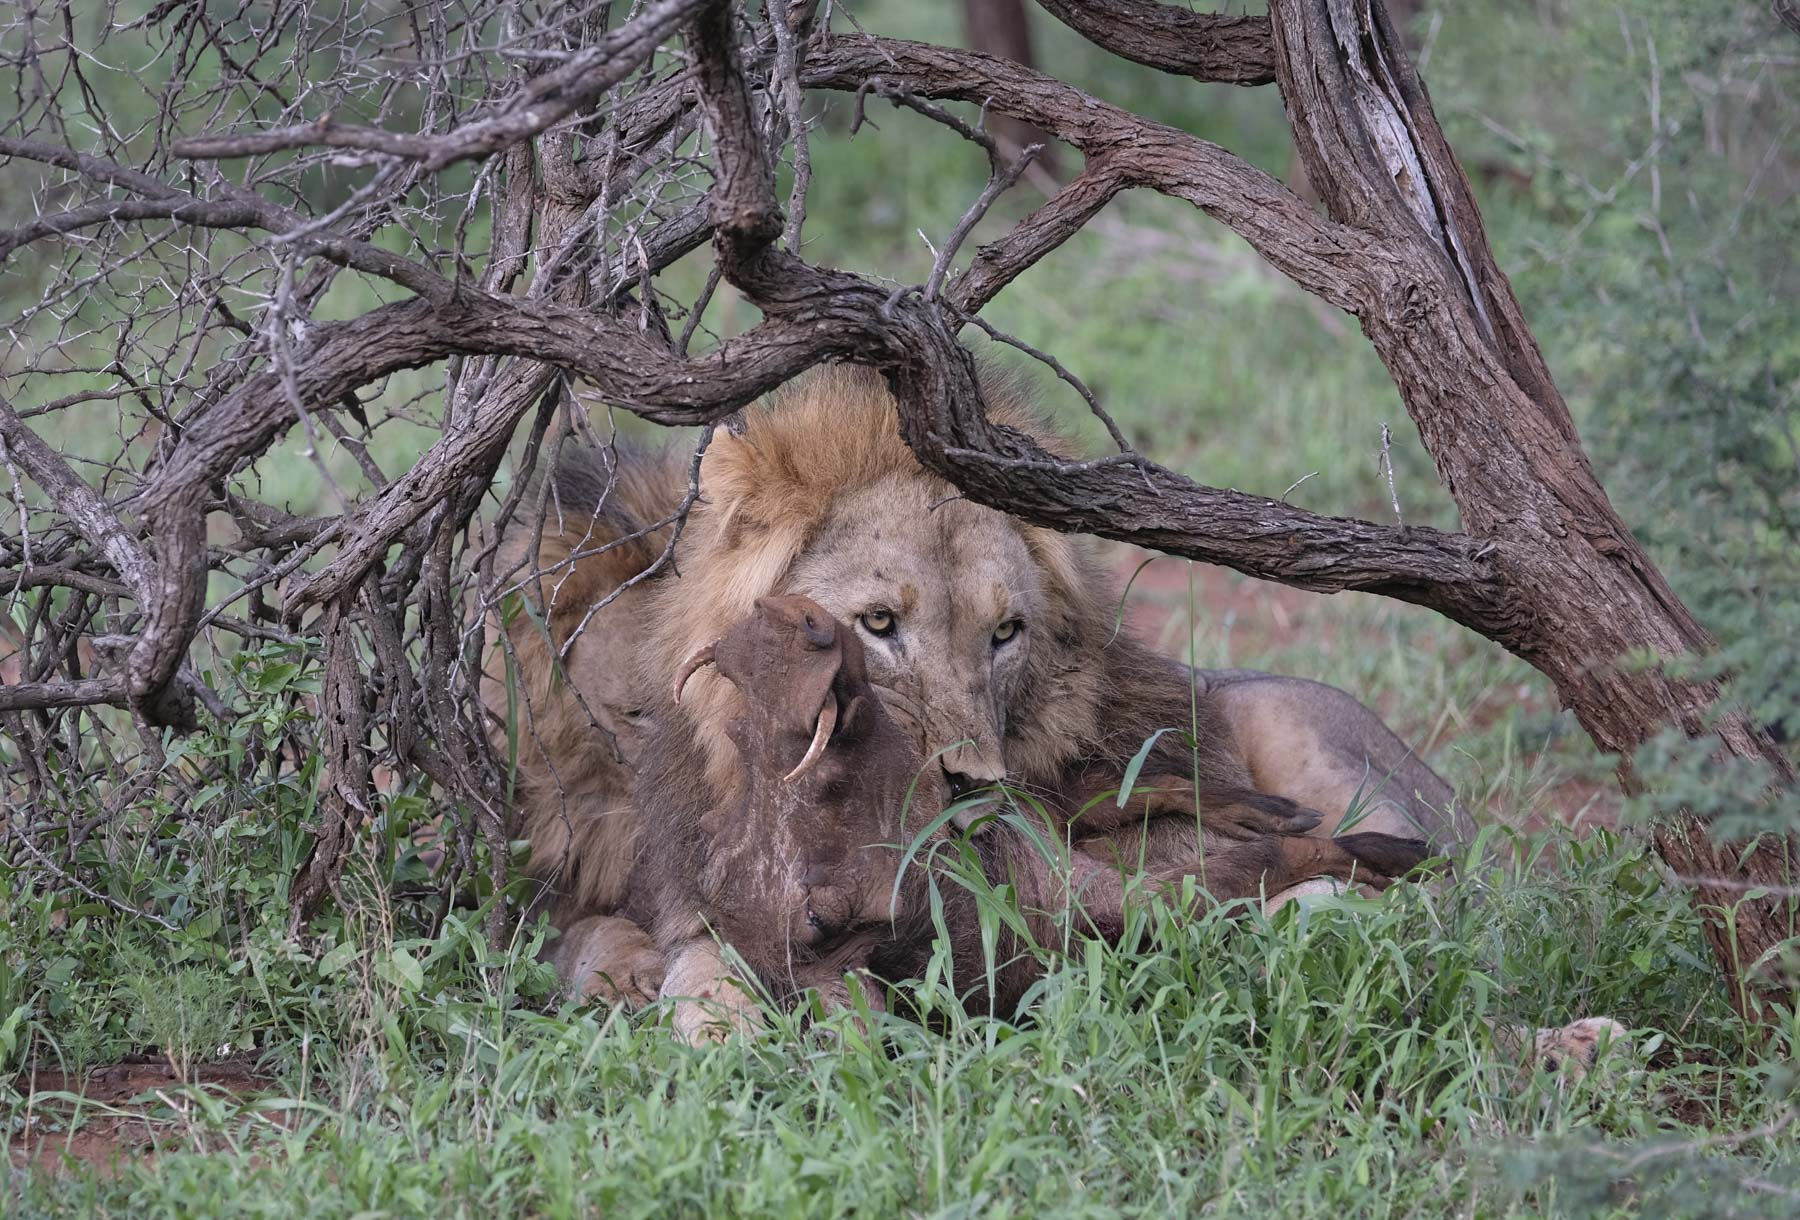 Lion and Warthog